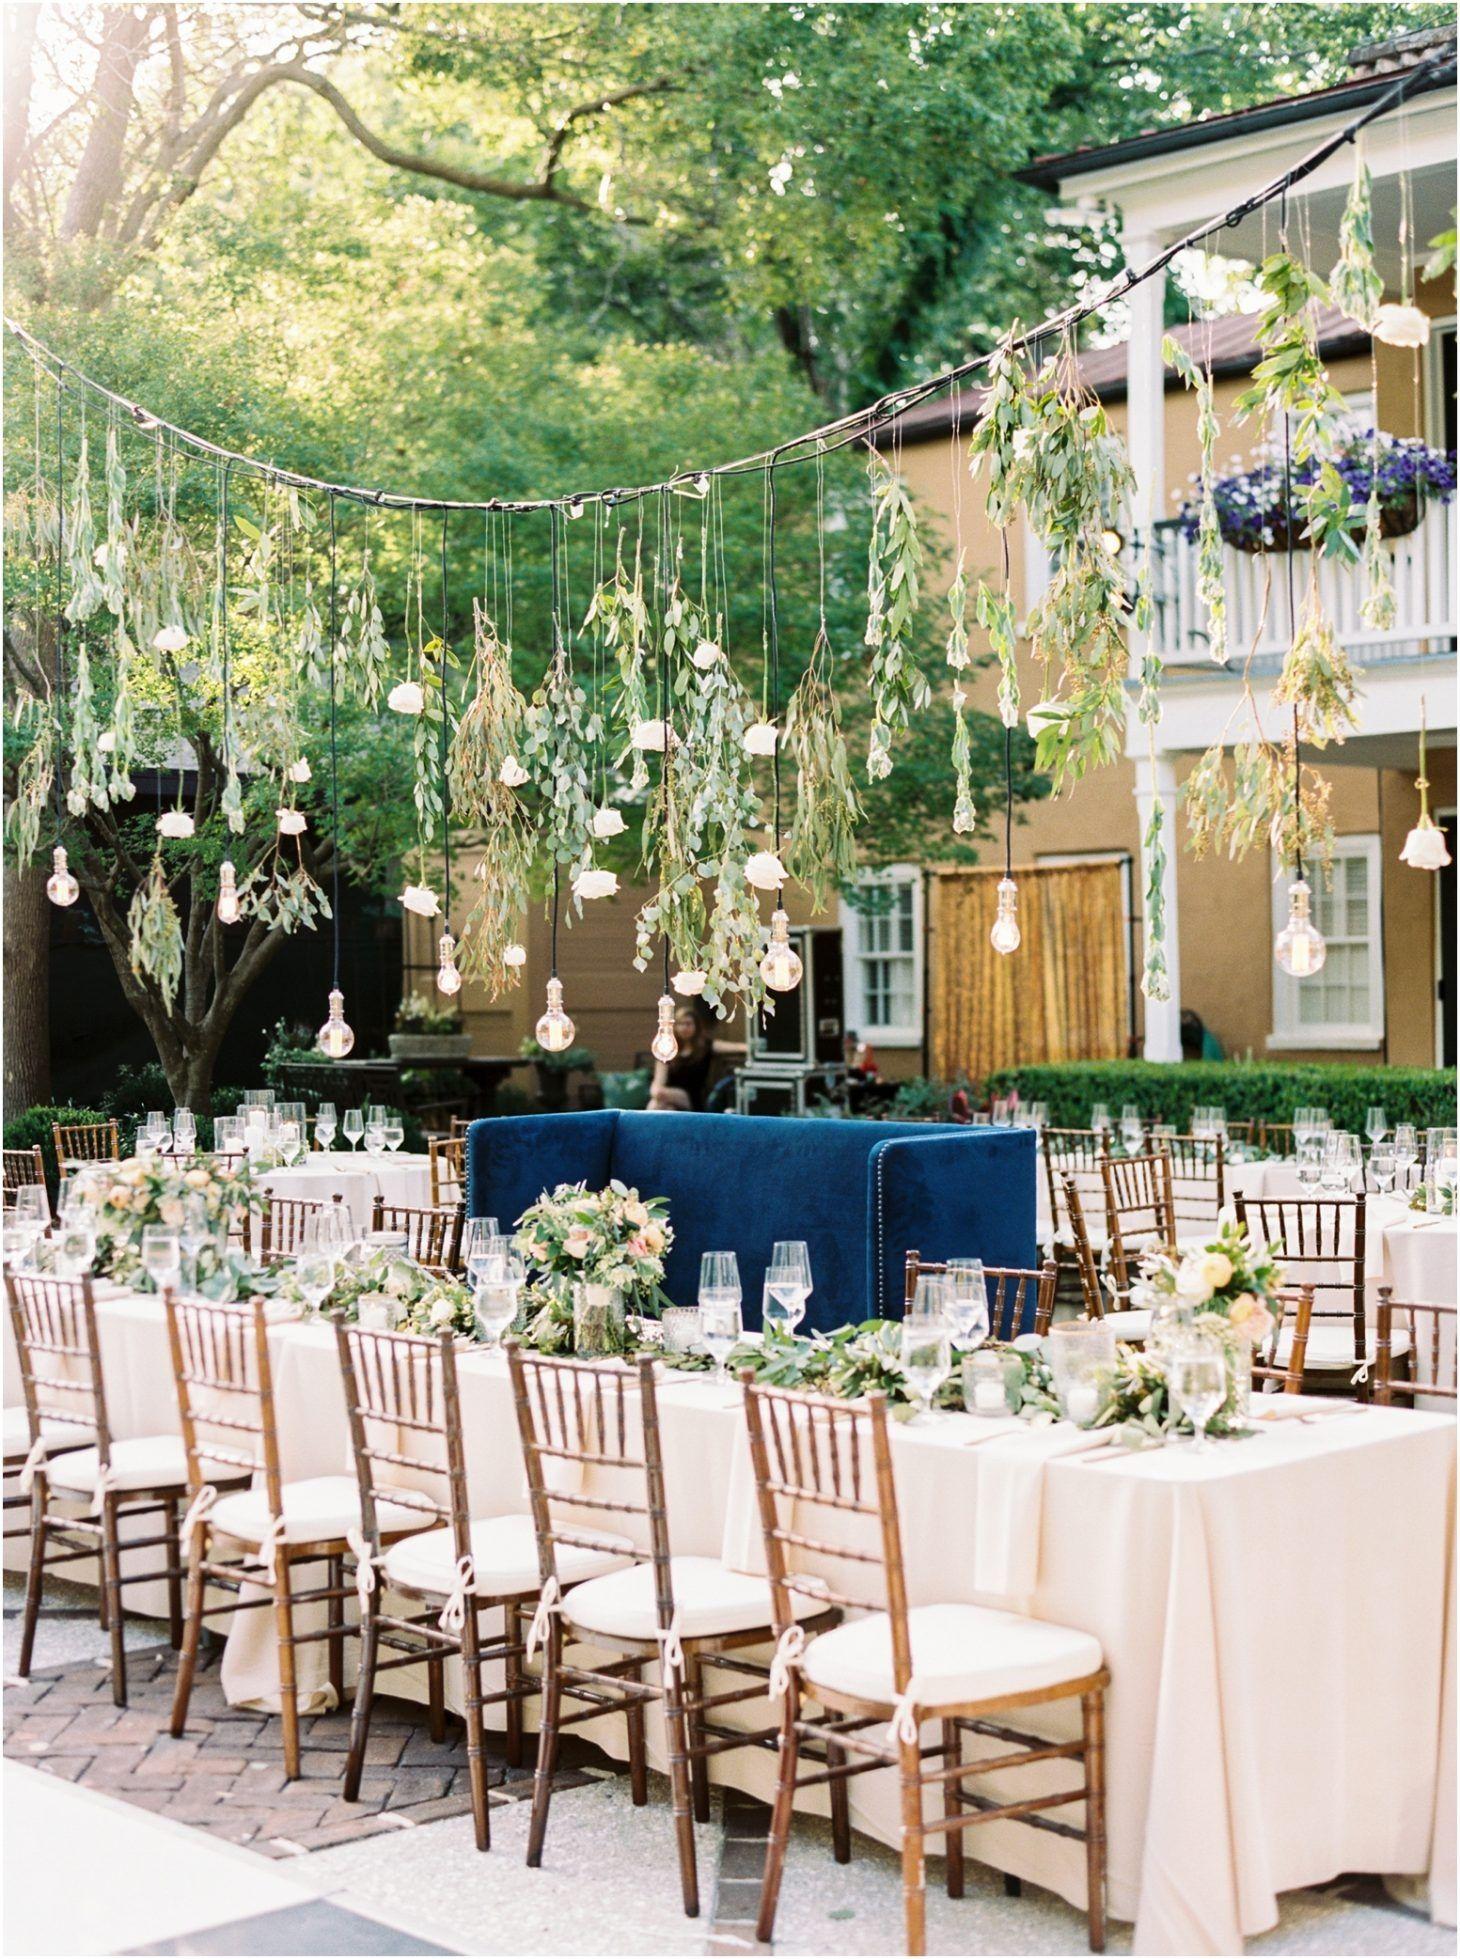 Wedding reception decor ideas love the vintage bulbs hanging over wedding reception decor ideas love the vintage bulbs hanging over the head table at junglespirit Choice Image